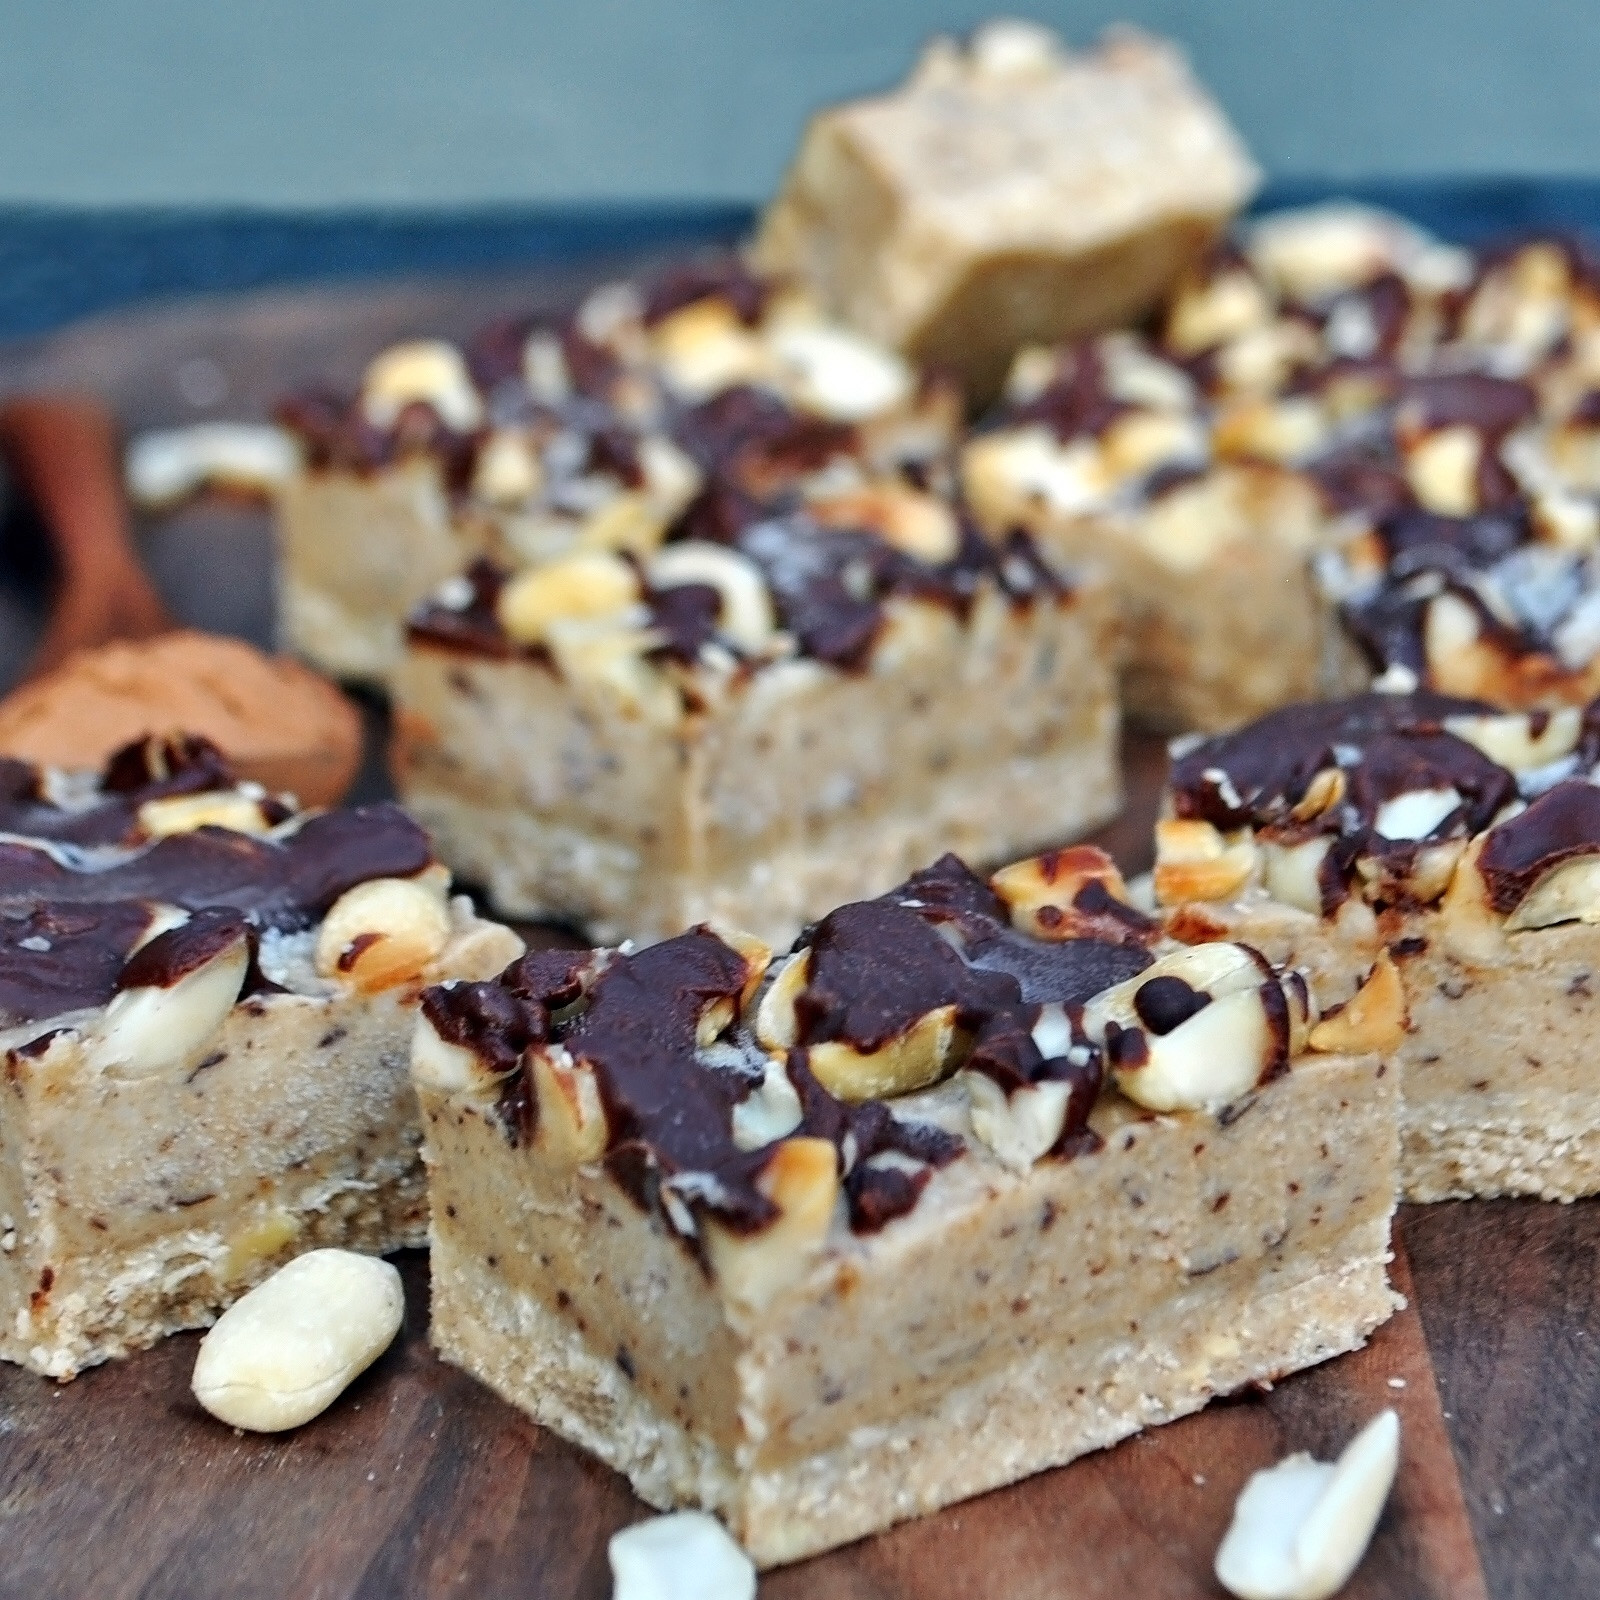 Raw Vegan Desserts  Nine Amazing Raw Vegan Desserts Rebel Recipes